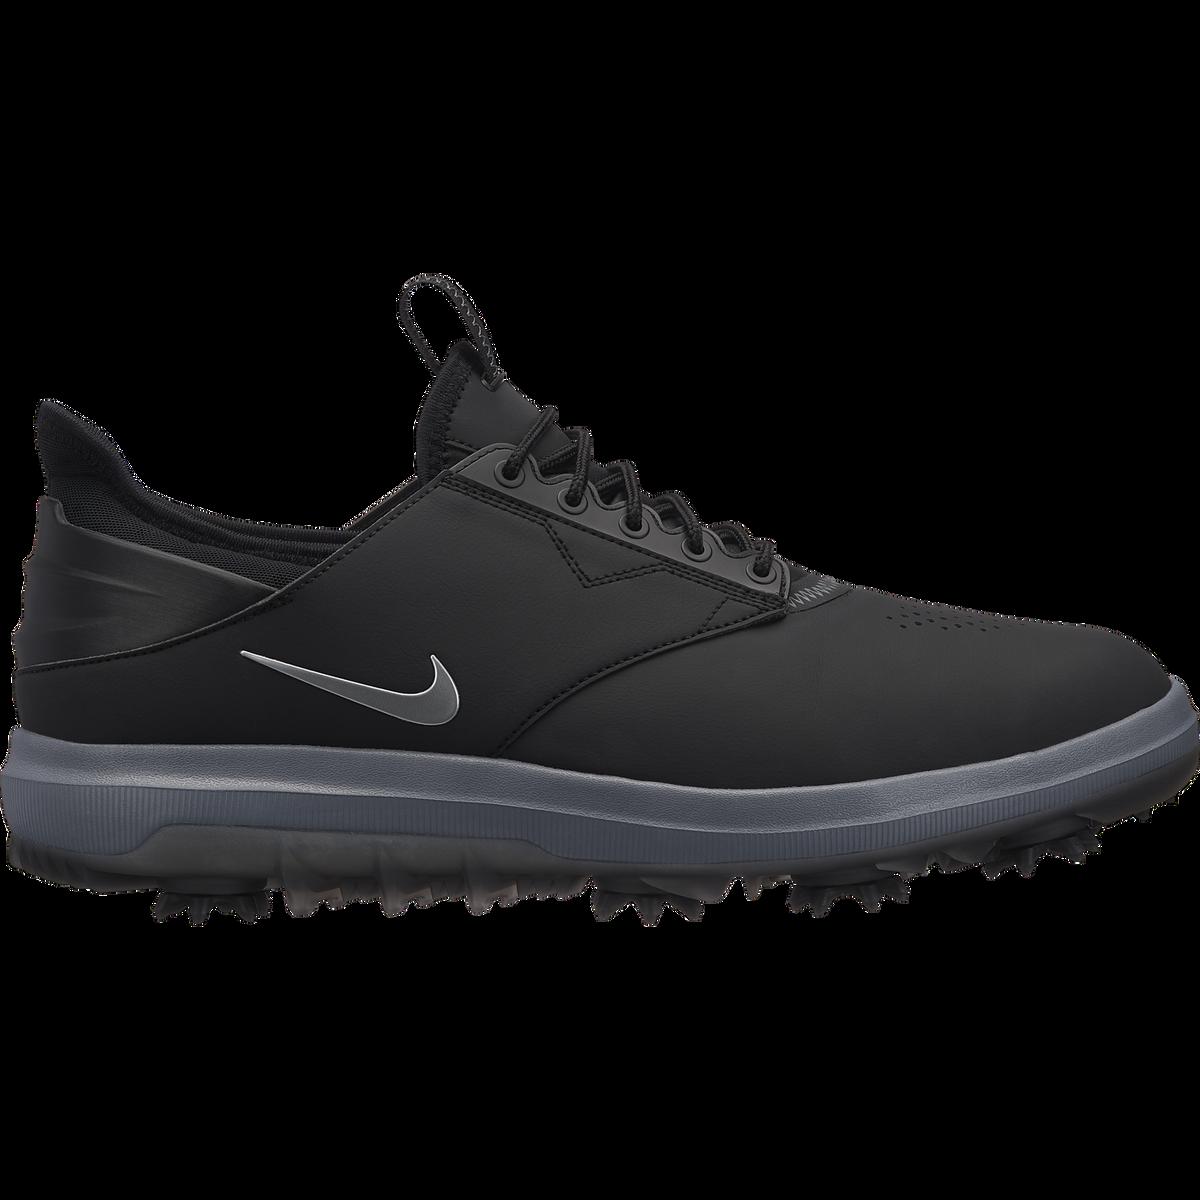 92a972f177c4 Nike Air Zoom Direct Men s Golf Shoe - Black Silver